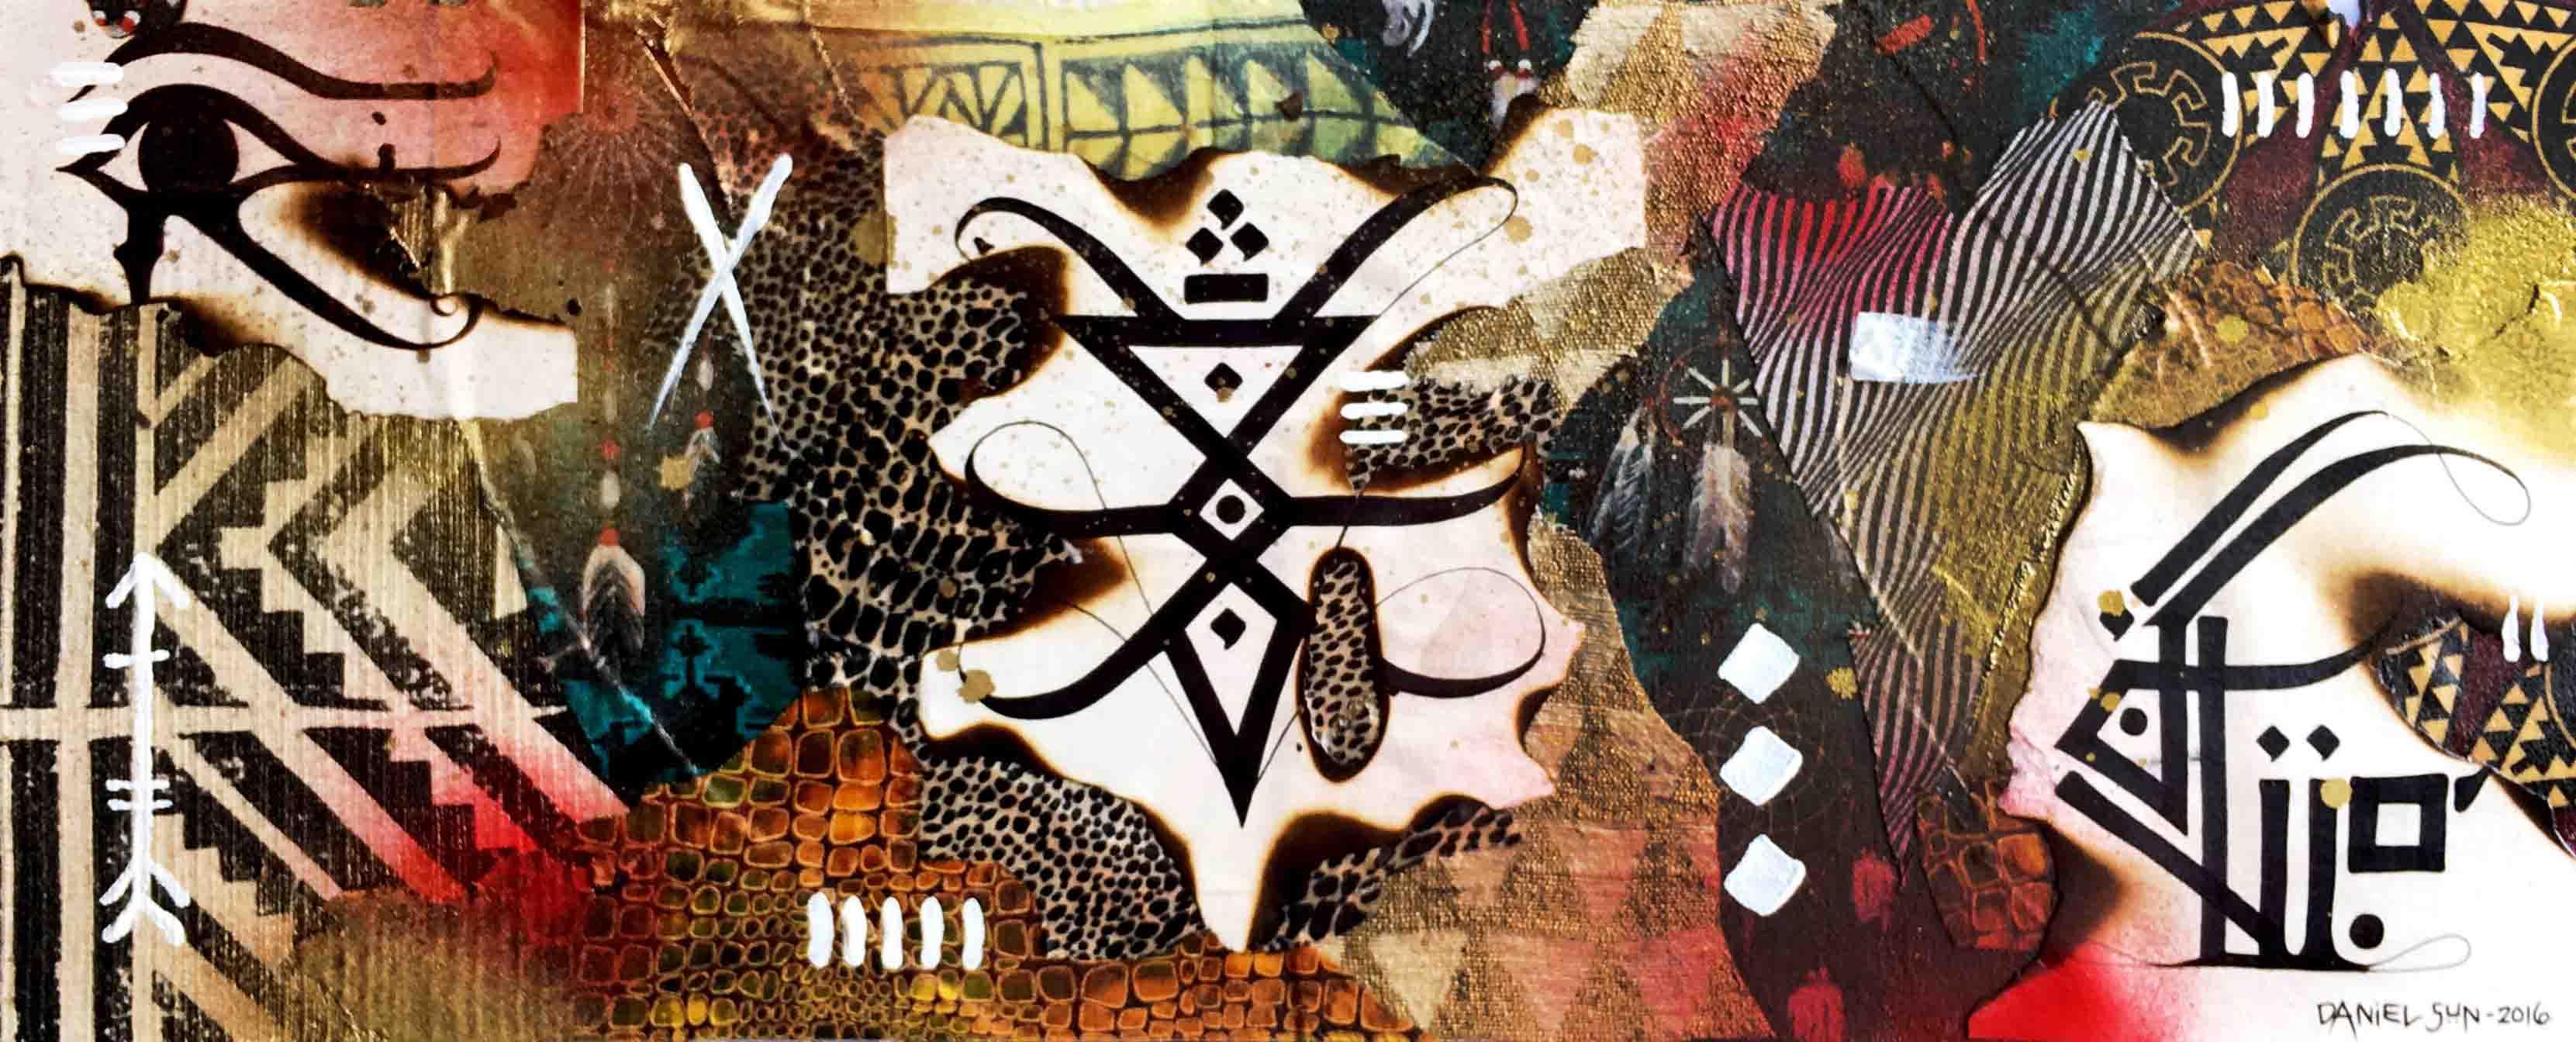 sbcltr-8-danielsun-collage